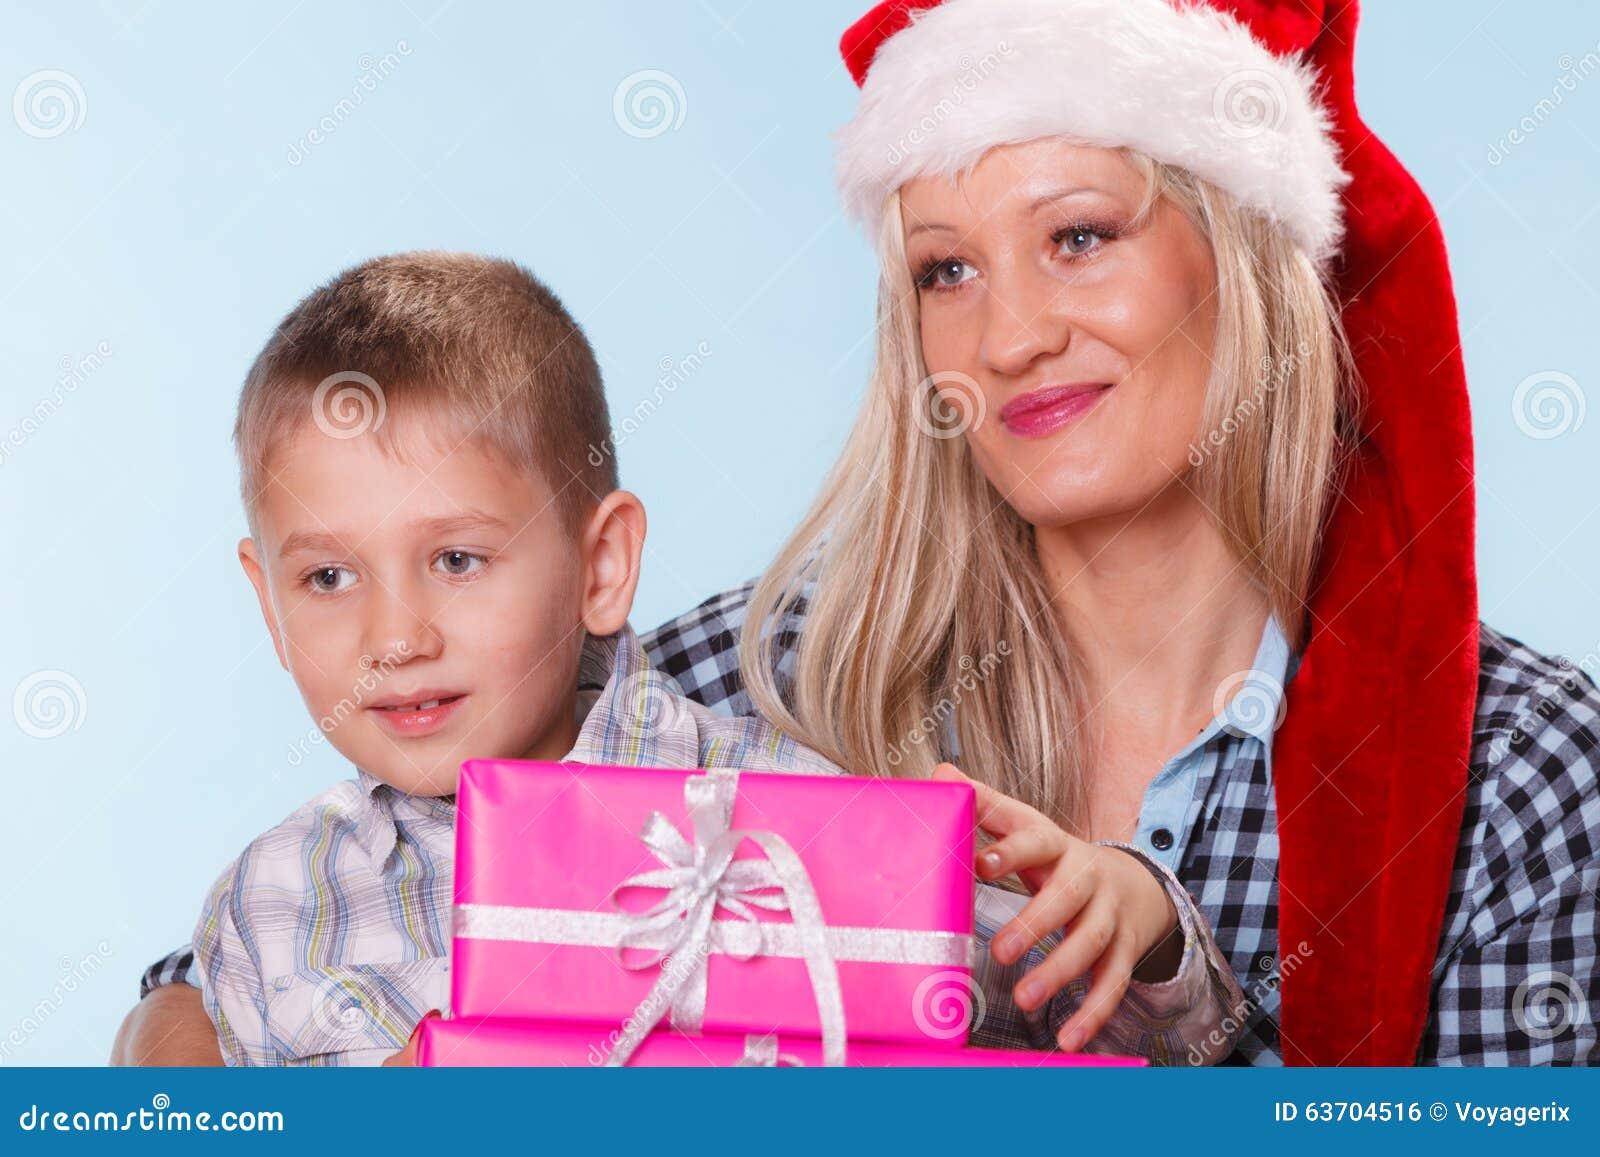 geile neukpartij vader neukt vriendin van zoon